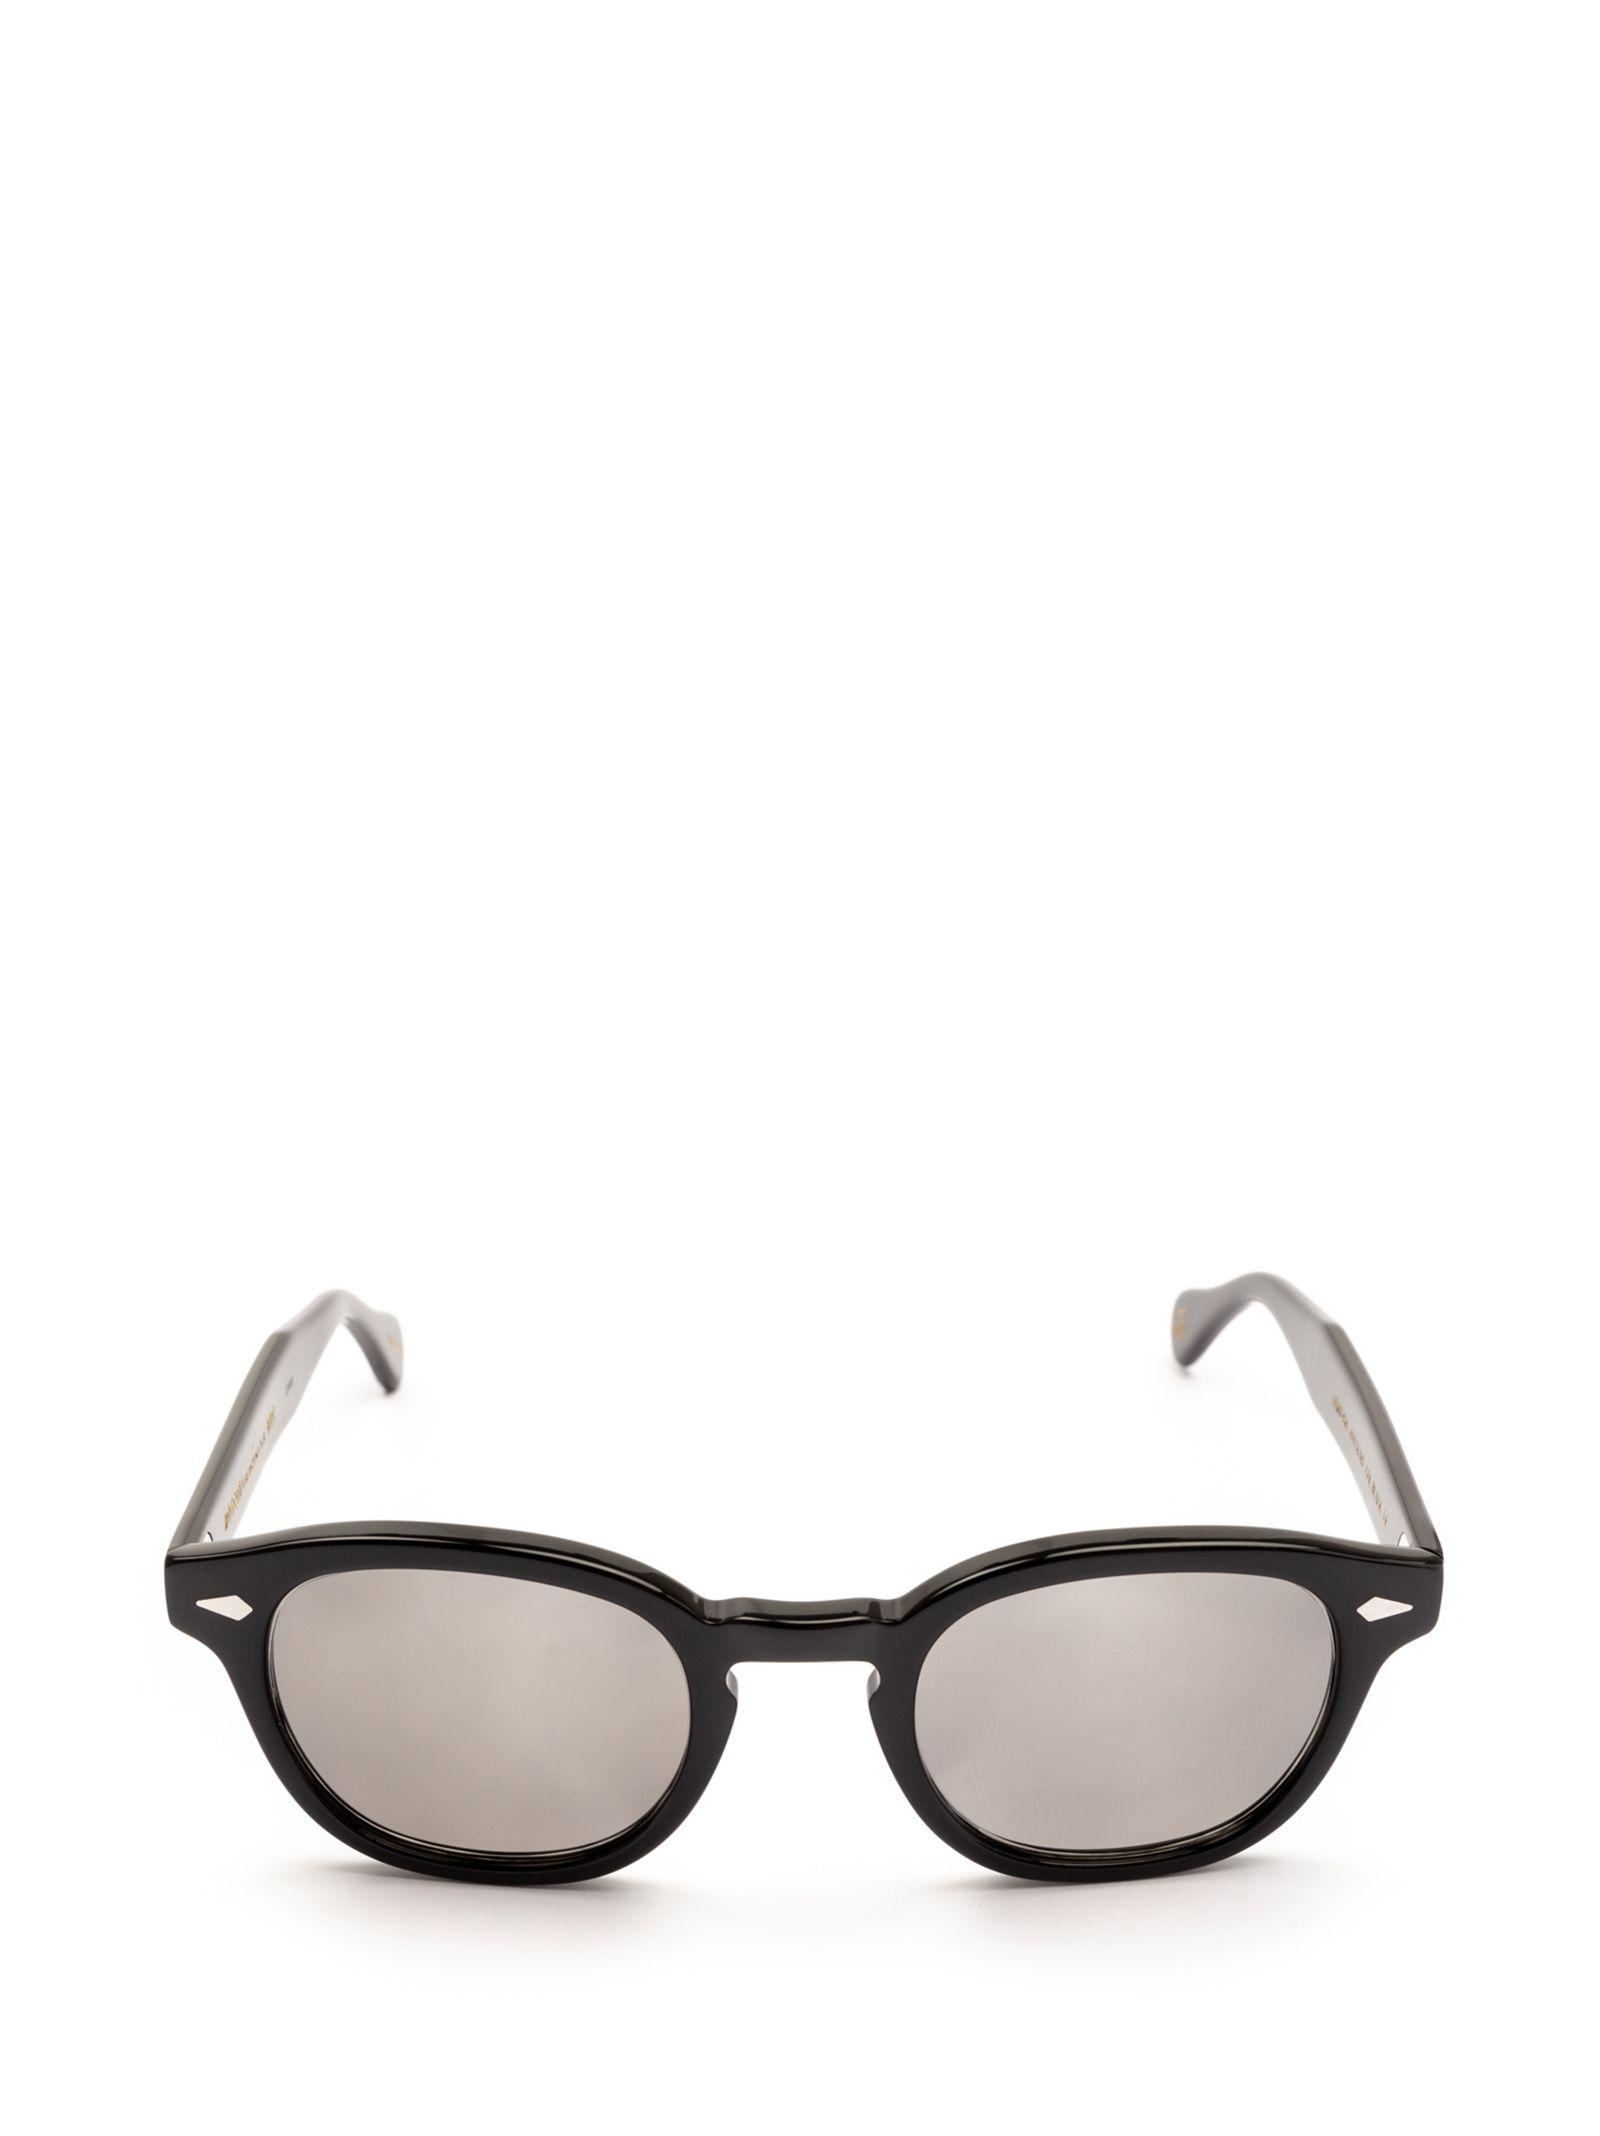 3cc99ba36377 Moscot Black Acetate Sunglasses in Black for Men - Lyst